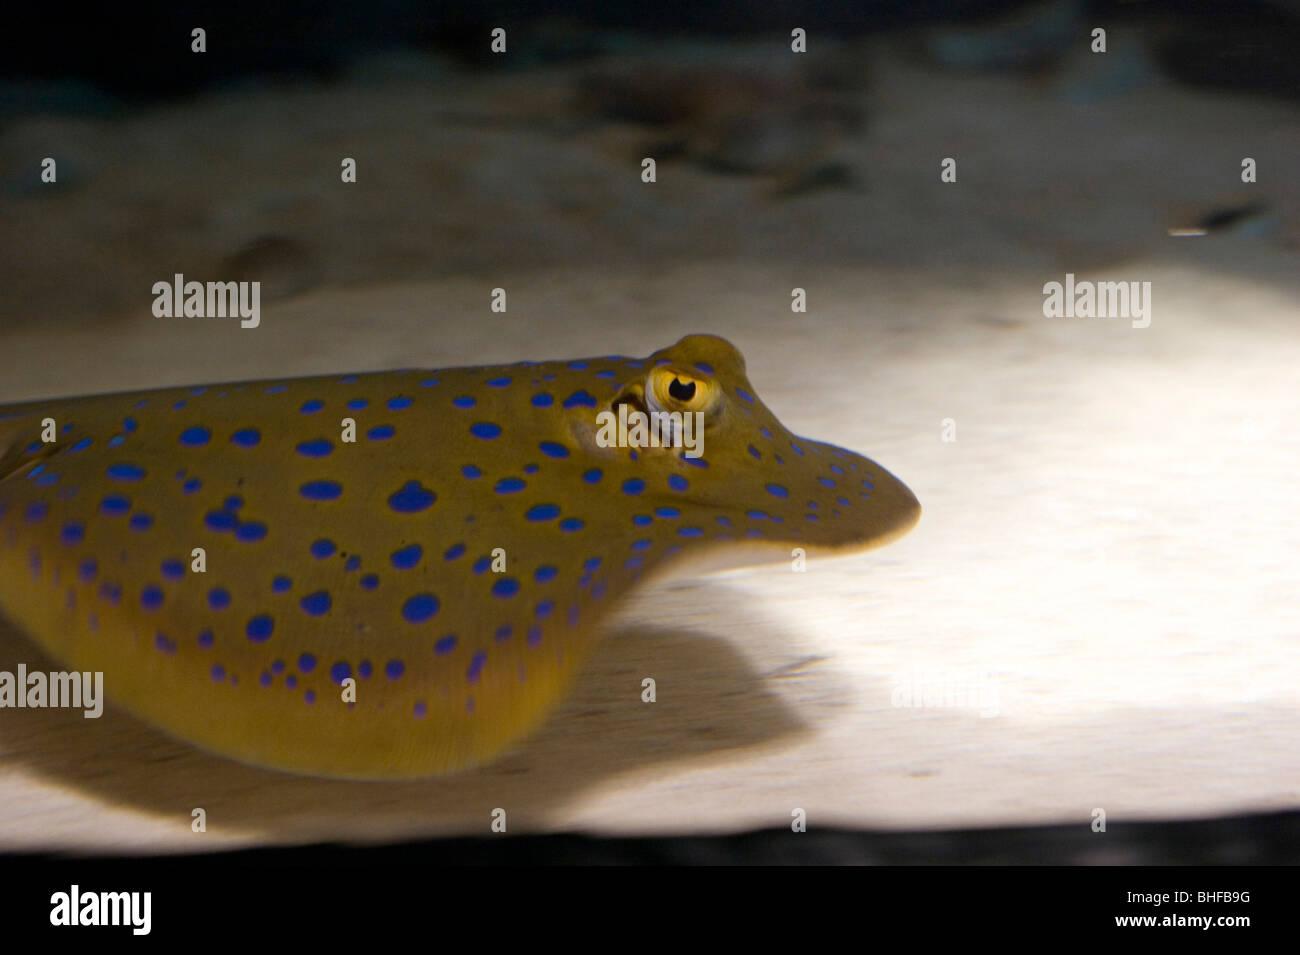 A stingray at the Reef HQ aquarium, Townsville, Queensland, Australia - Stock Image